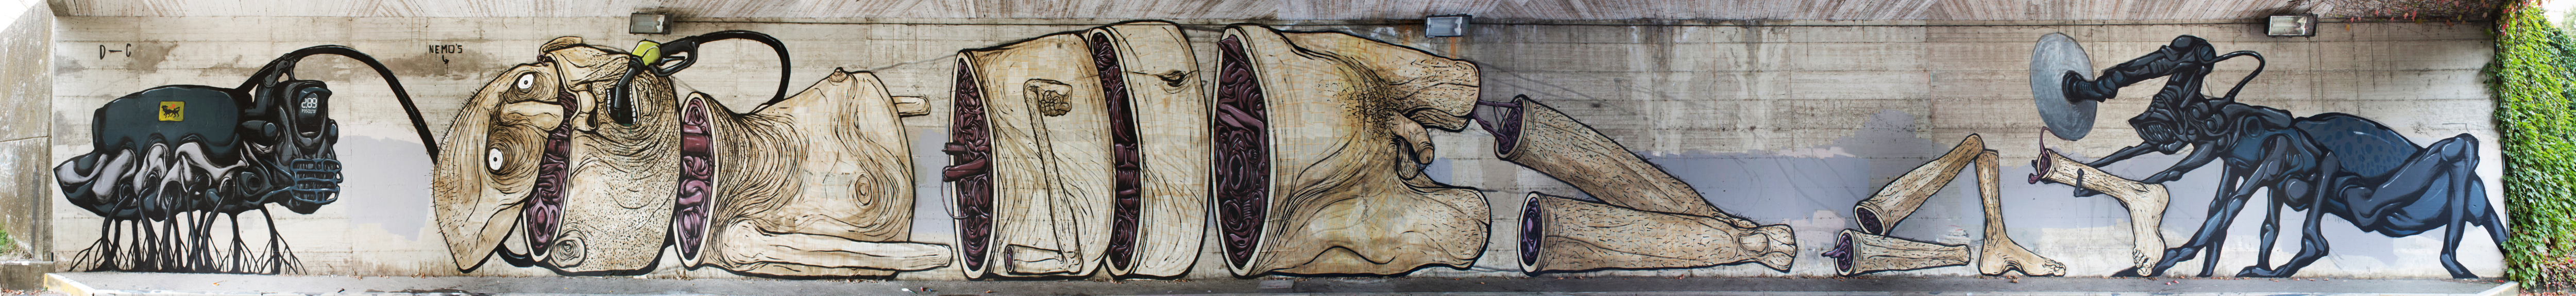 brooklyn-street-art-dissenso-cognitivo-nemos-imola-italy-10-14-resized-5